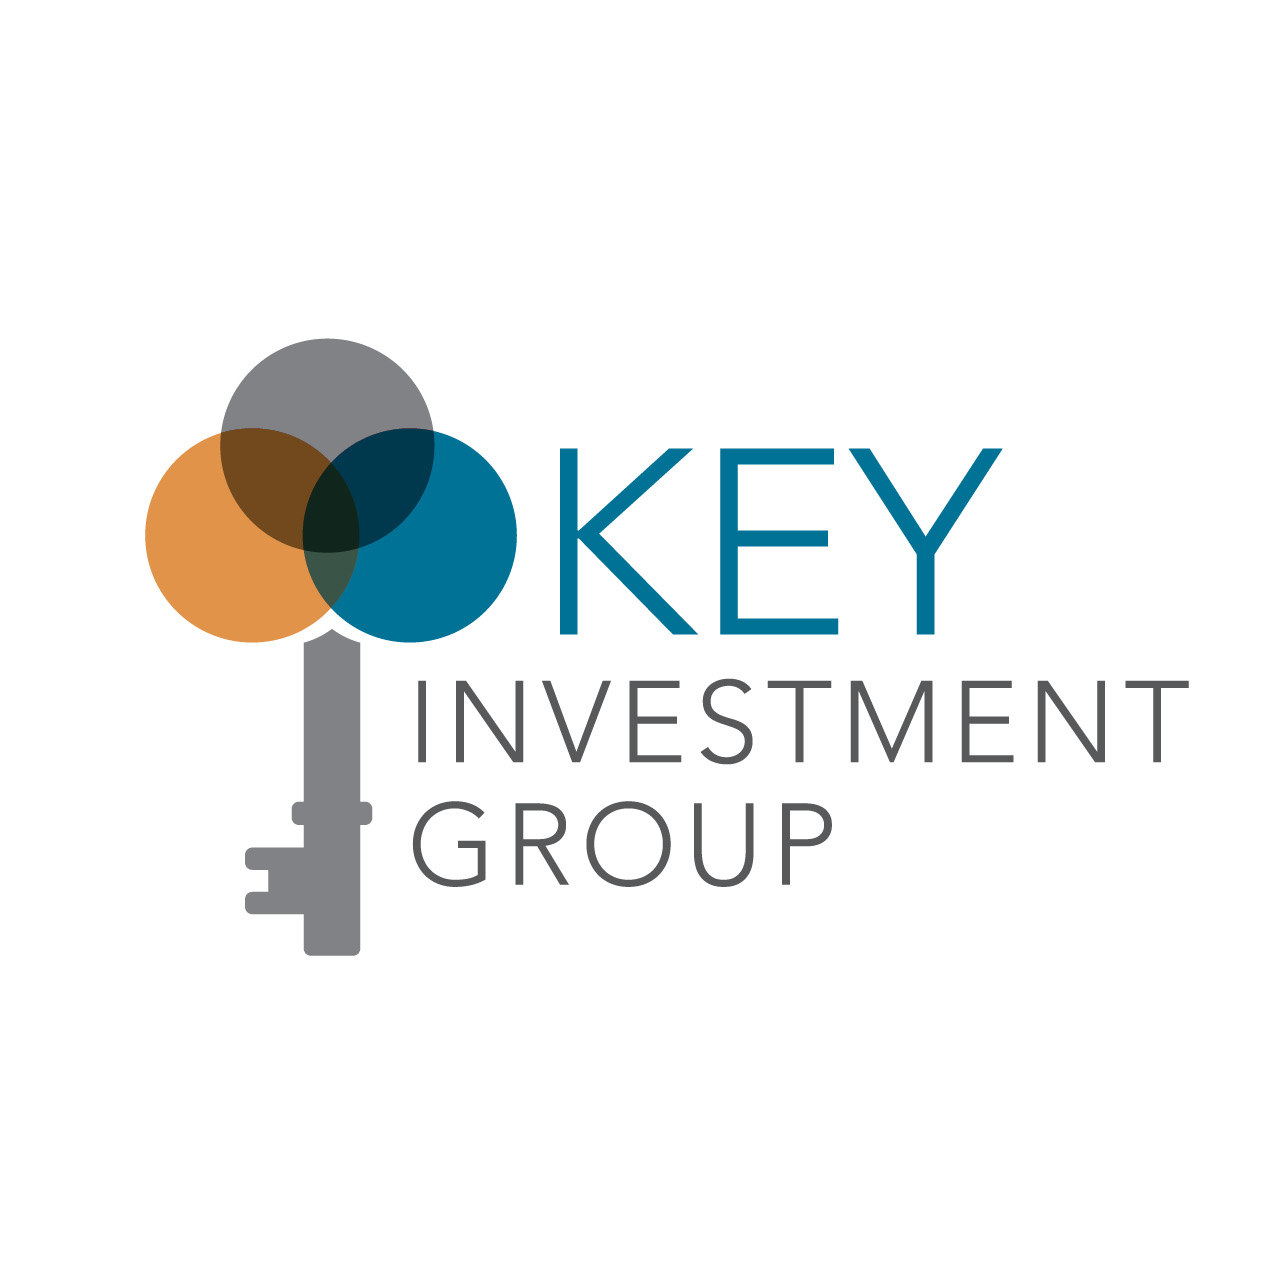 Key_Investment_grouplogo_FINAL